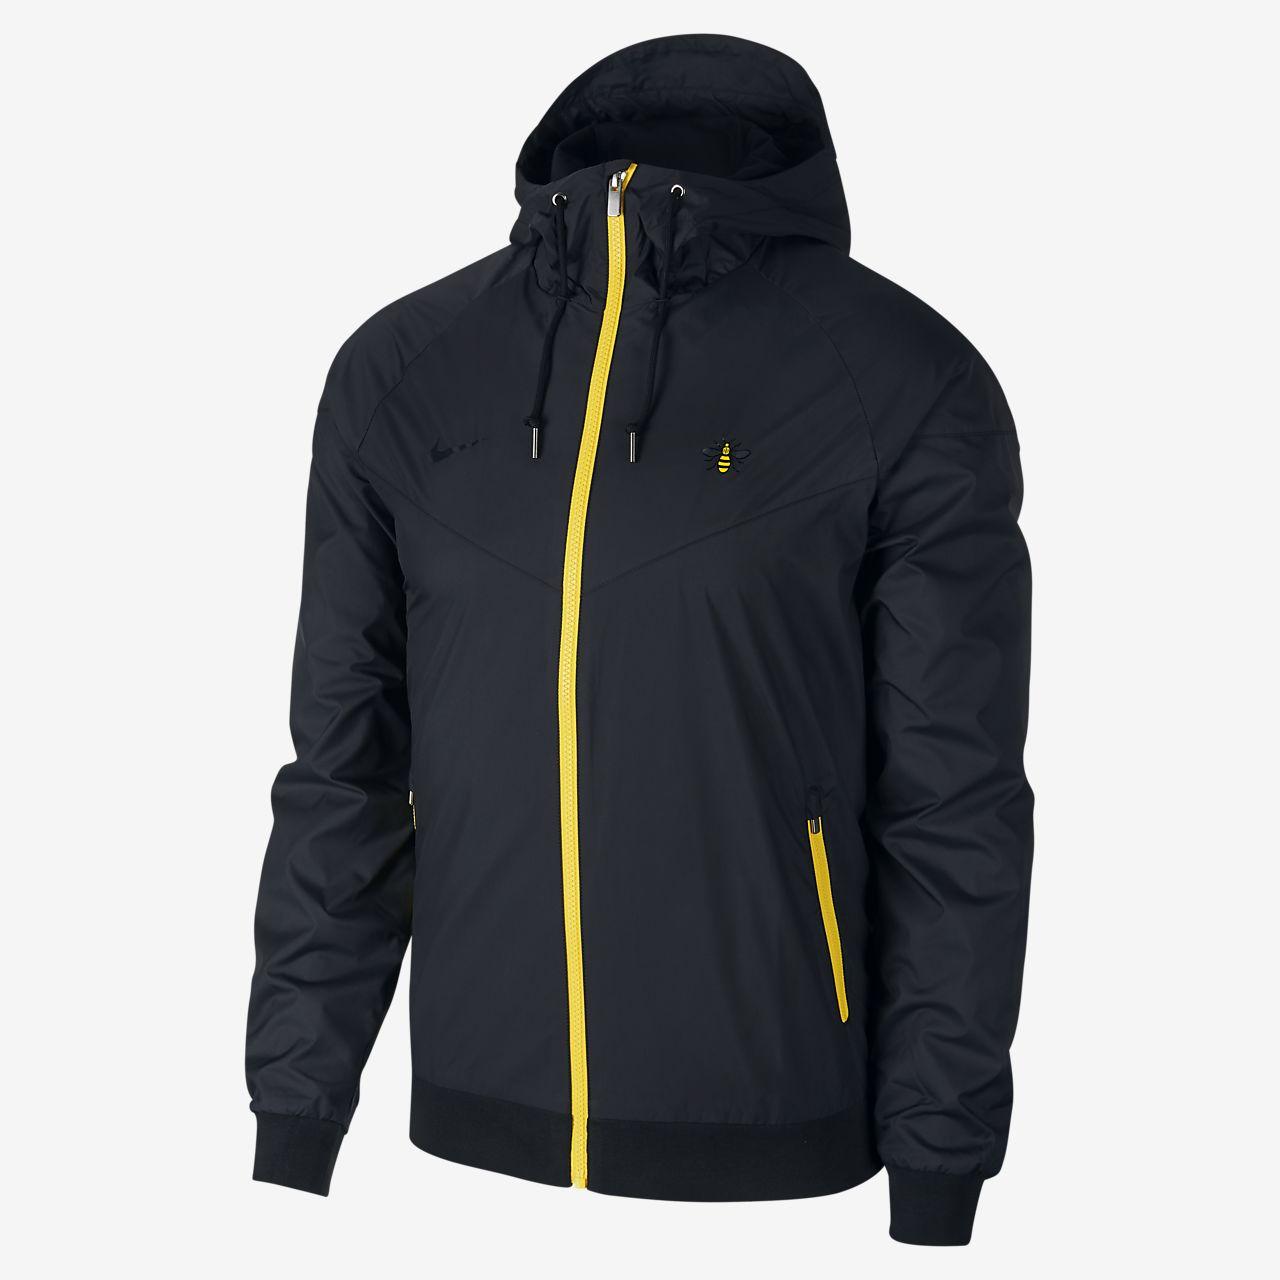 0bfb69427729 Manchester City FC Windrunner Men s Jacket. Nike.com IE